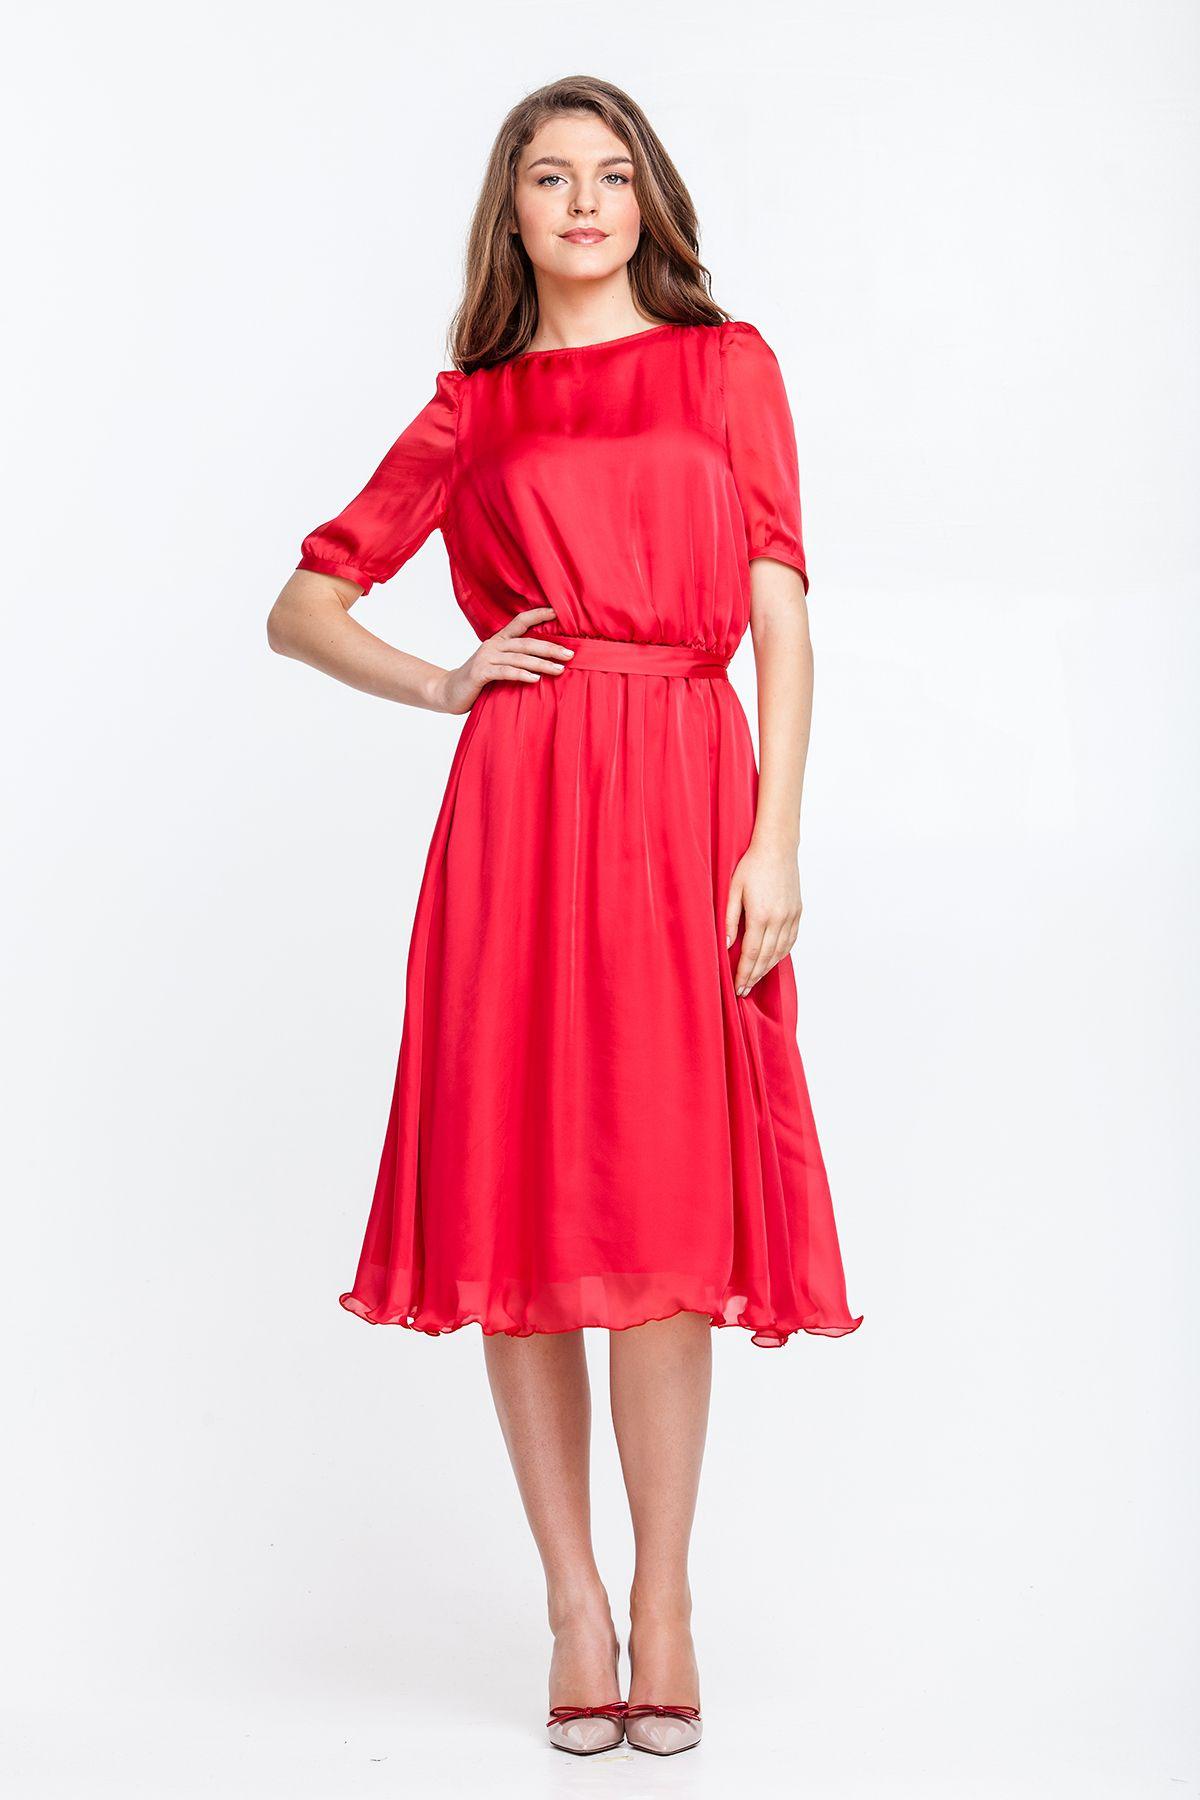 ed7d1e4dd42 2199 Платье красное шелковое